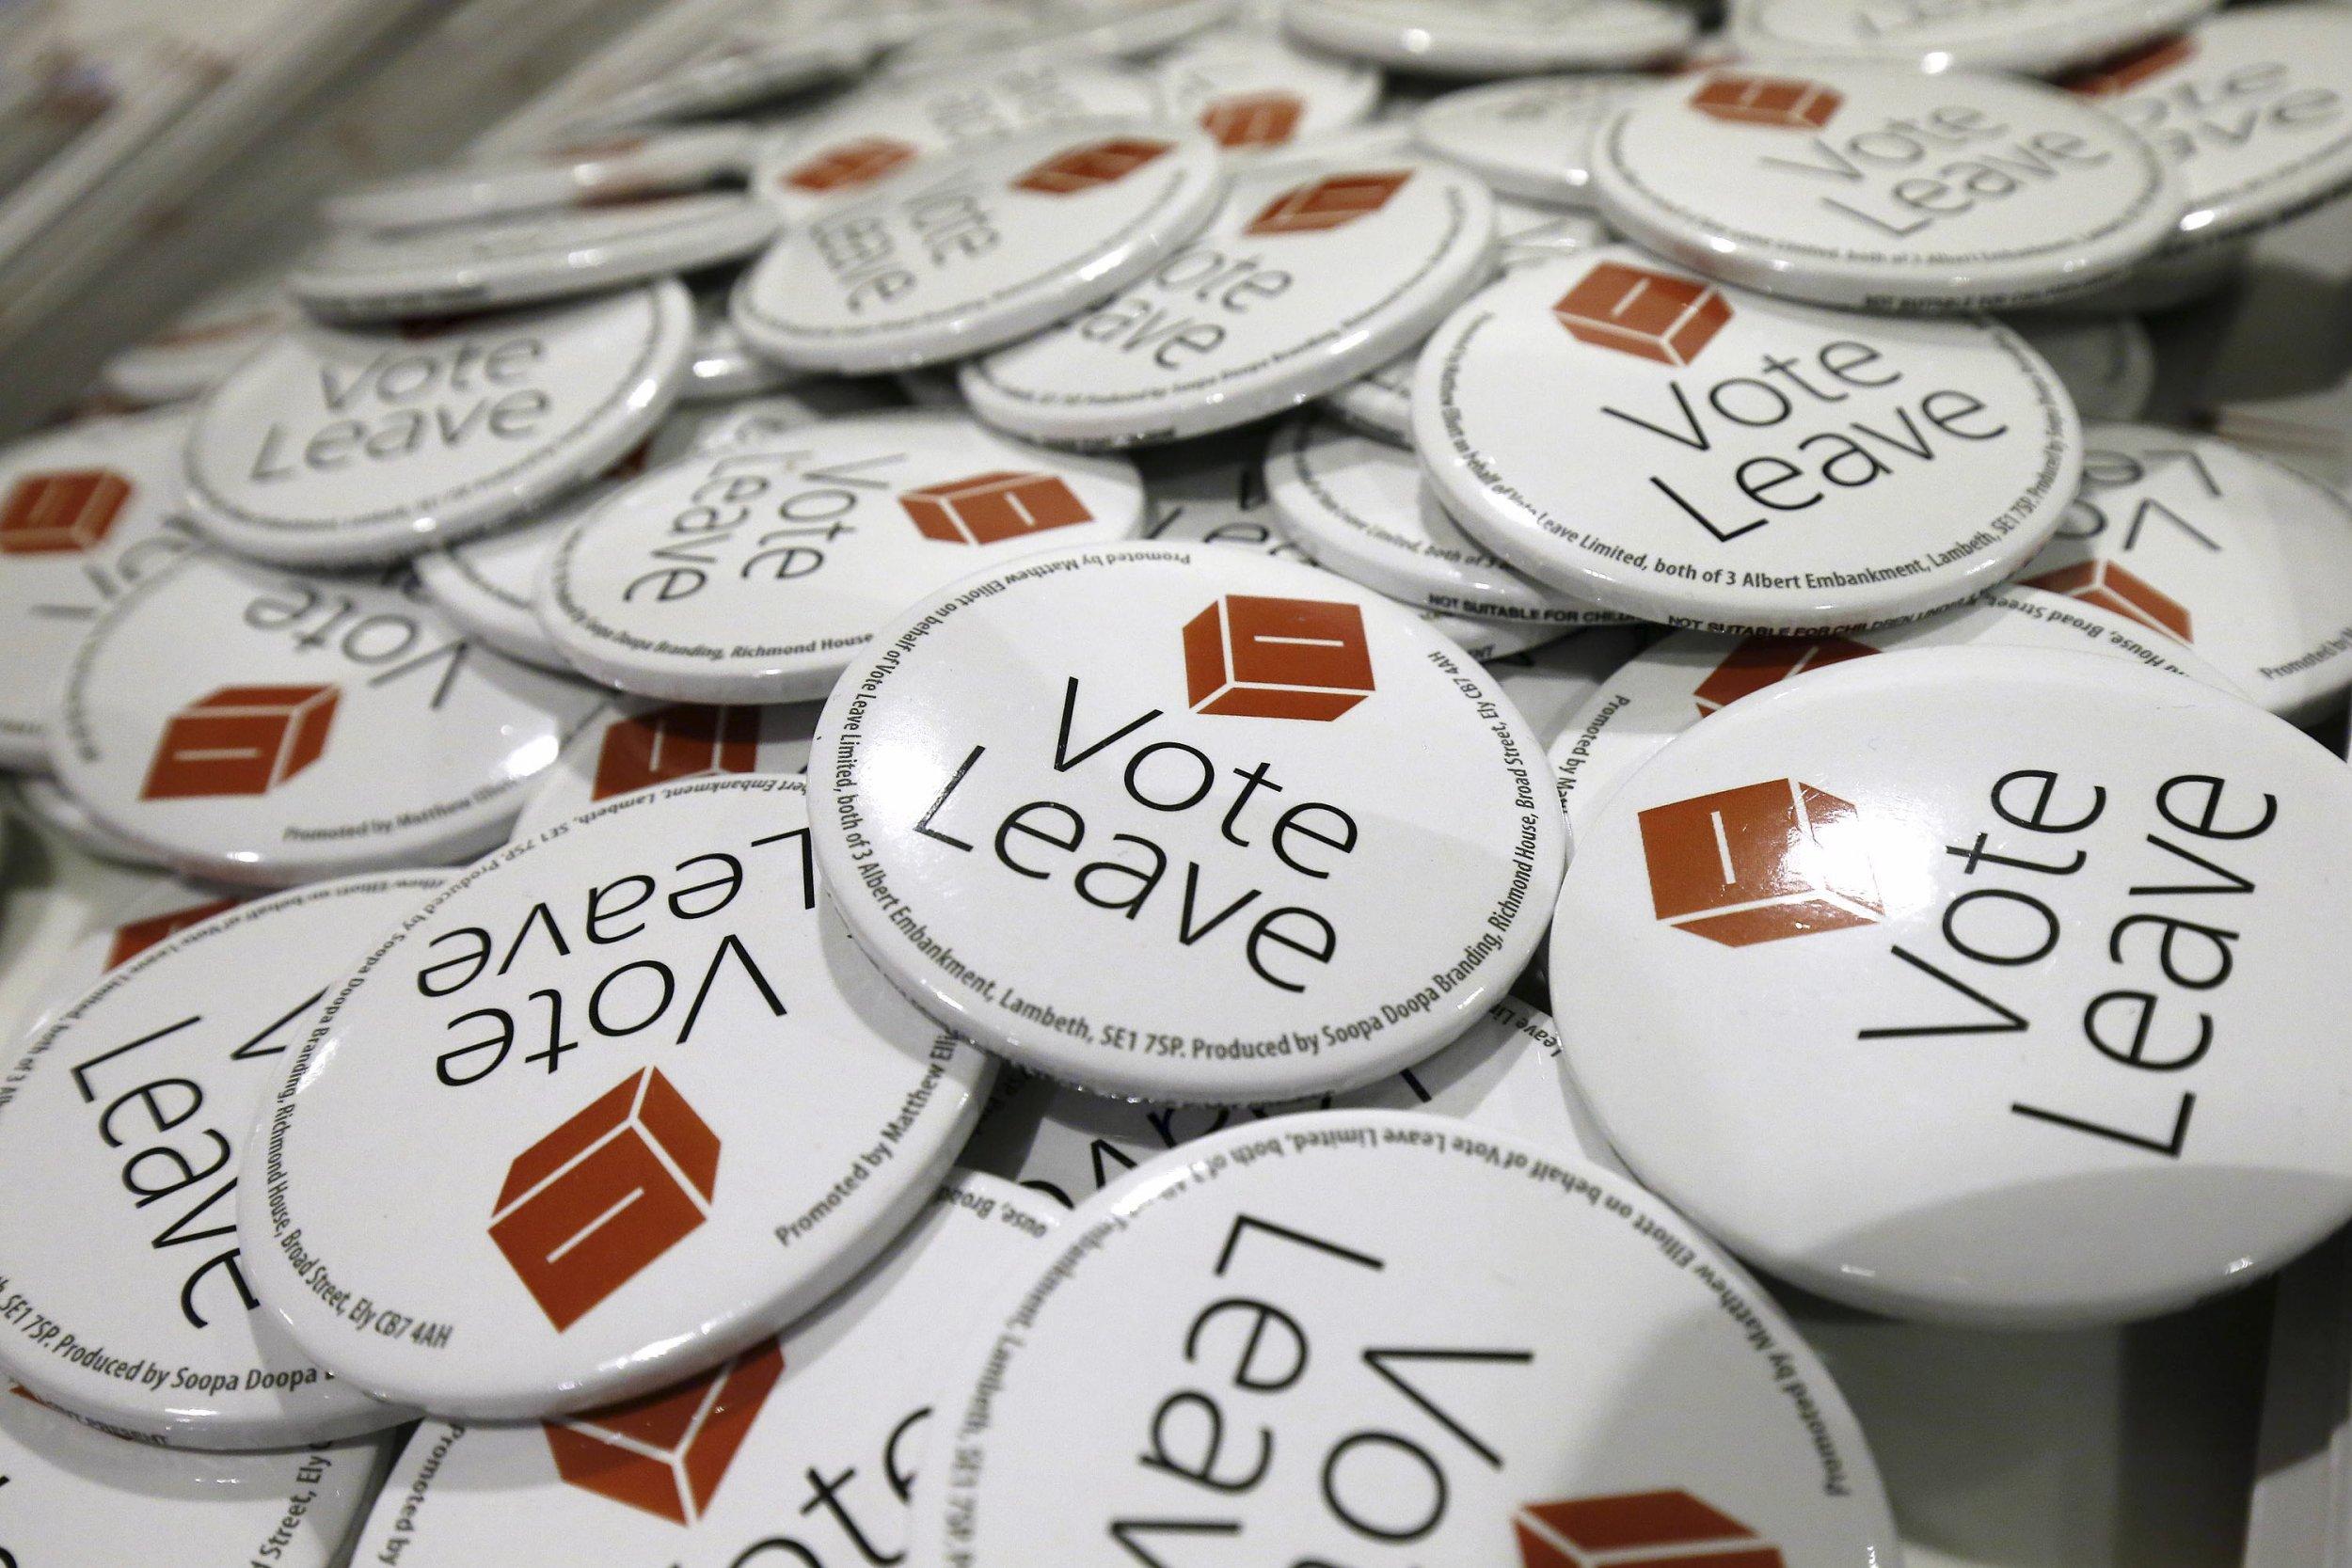 15/04/2016-Vote Leave Badges